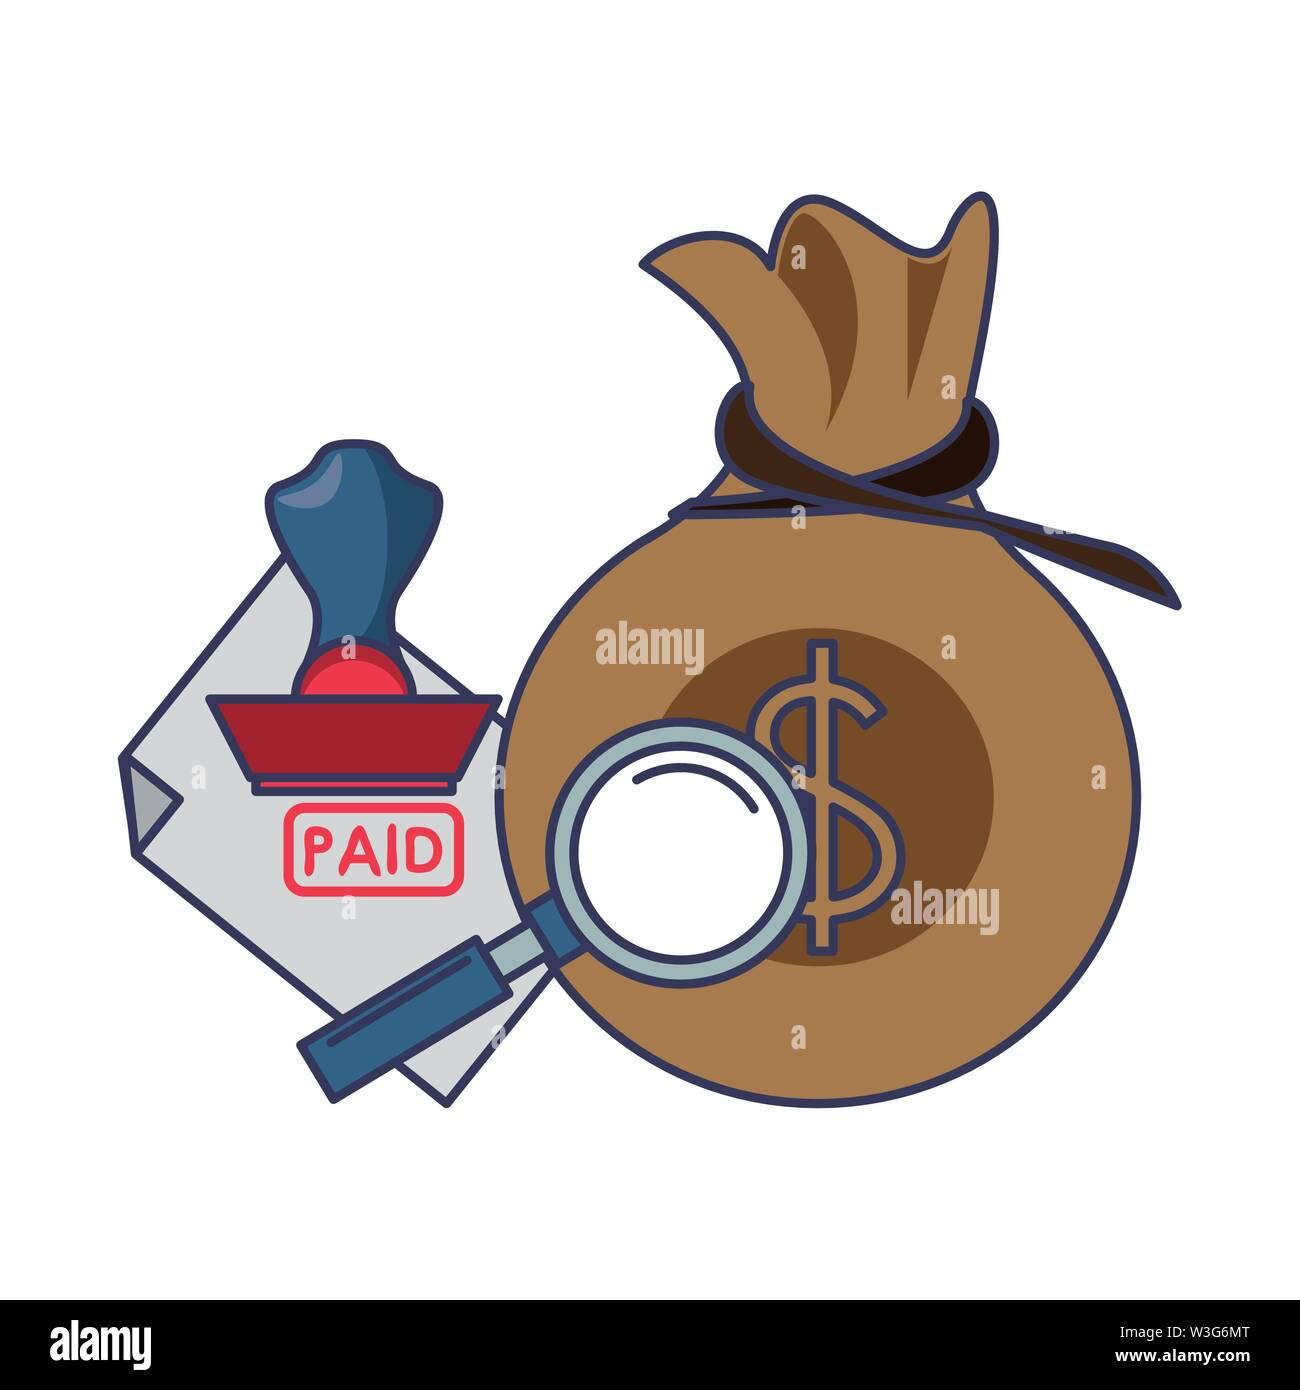 Geld sparen Business Finance banking Zahlung Konzept Elemente cartoon Vector Illustration graphic design Stockbild